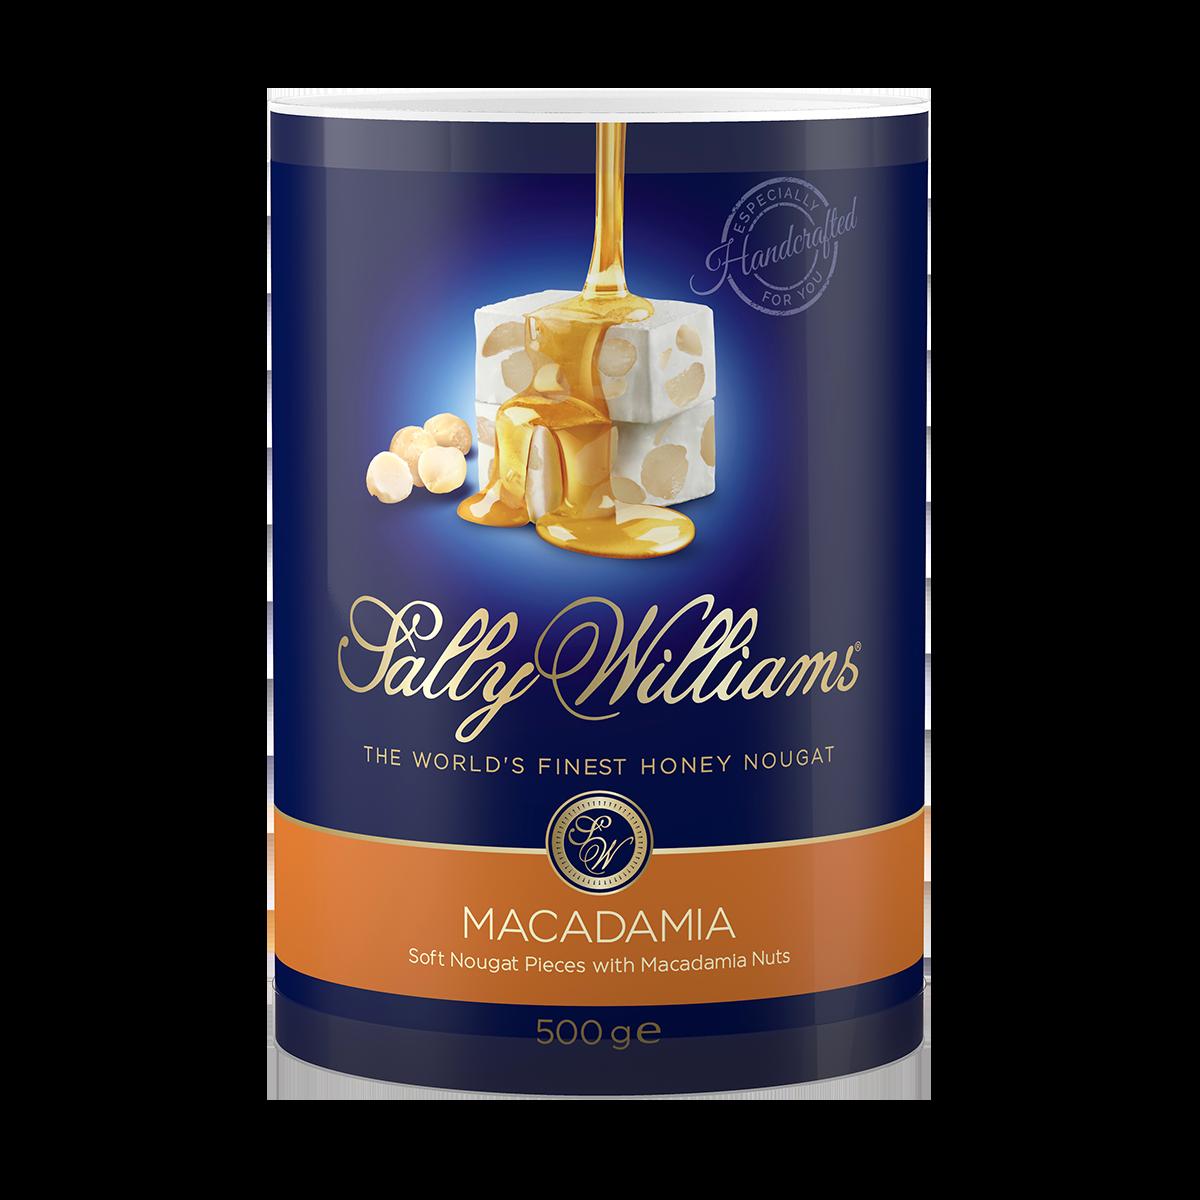 500g Tub Macadamia Nougat